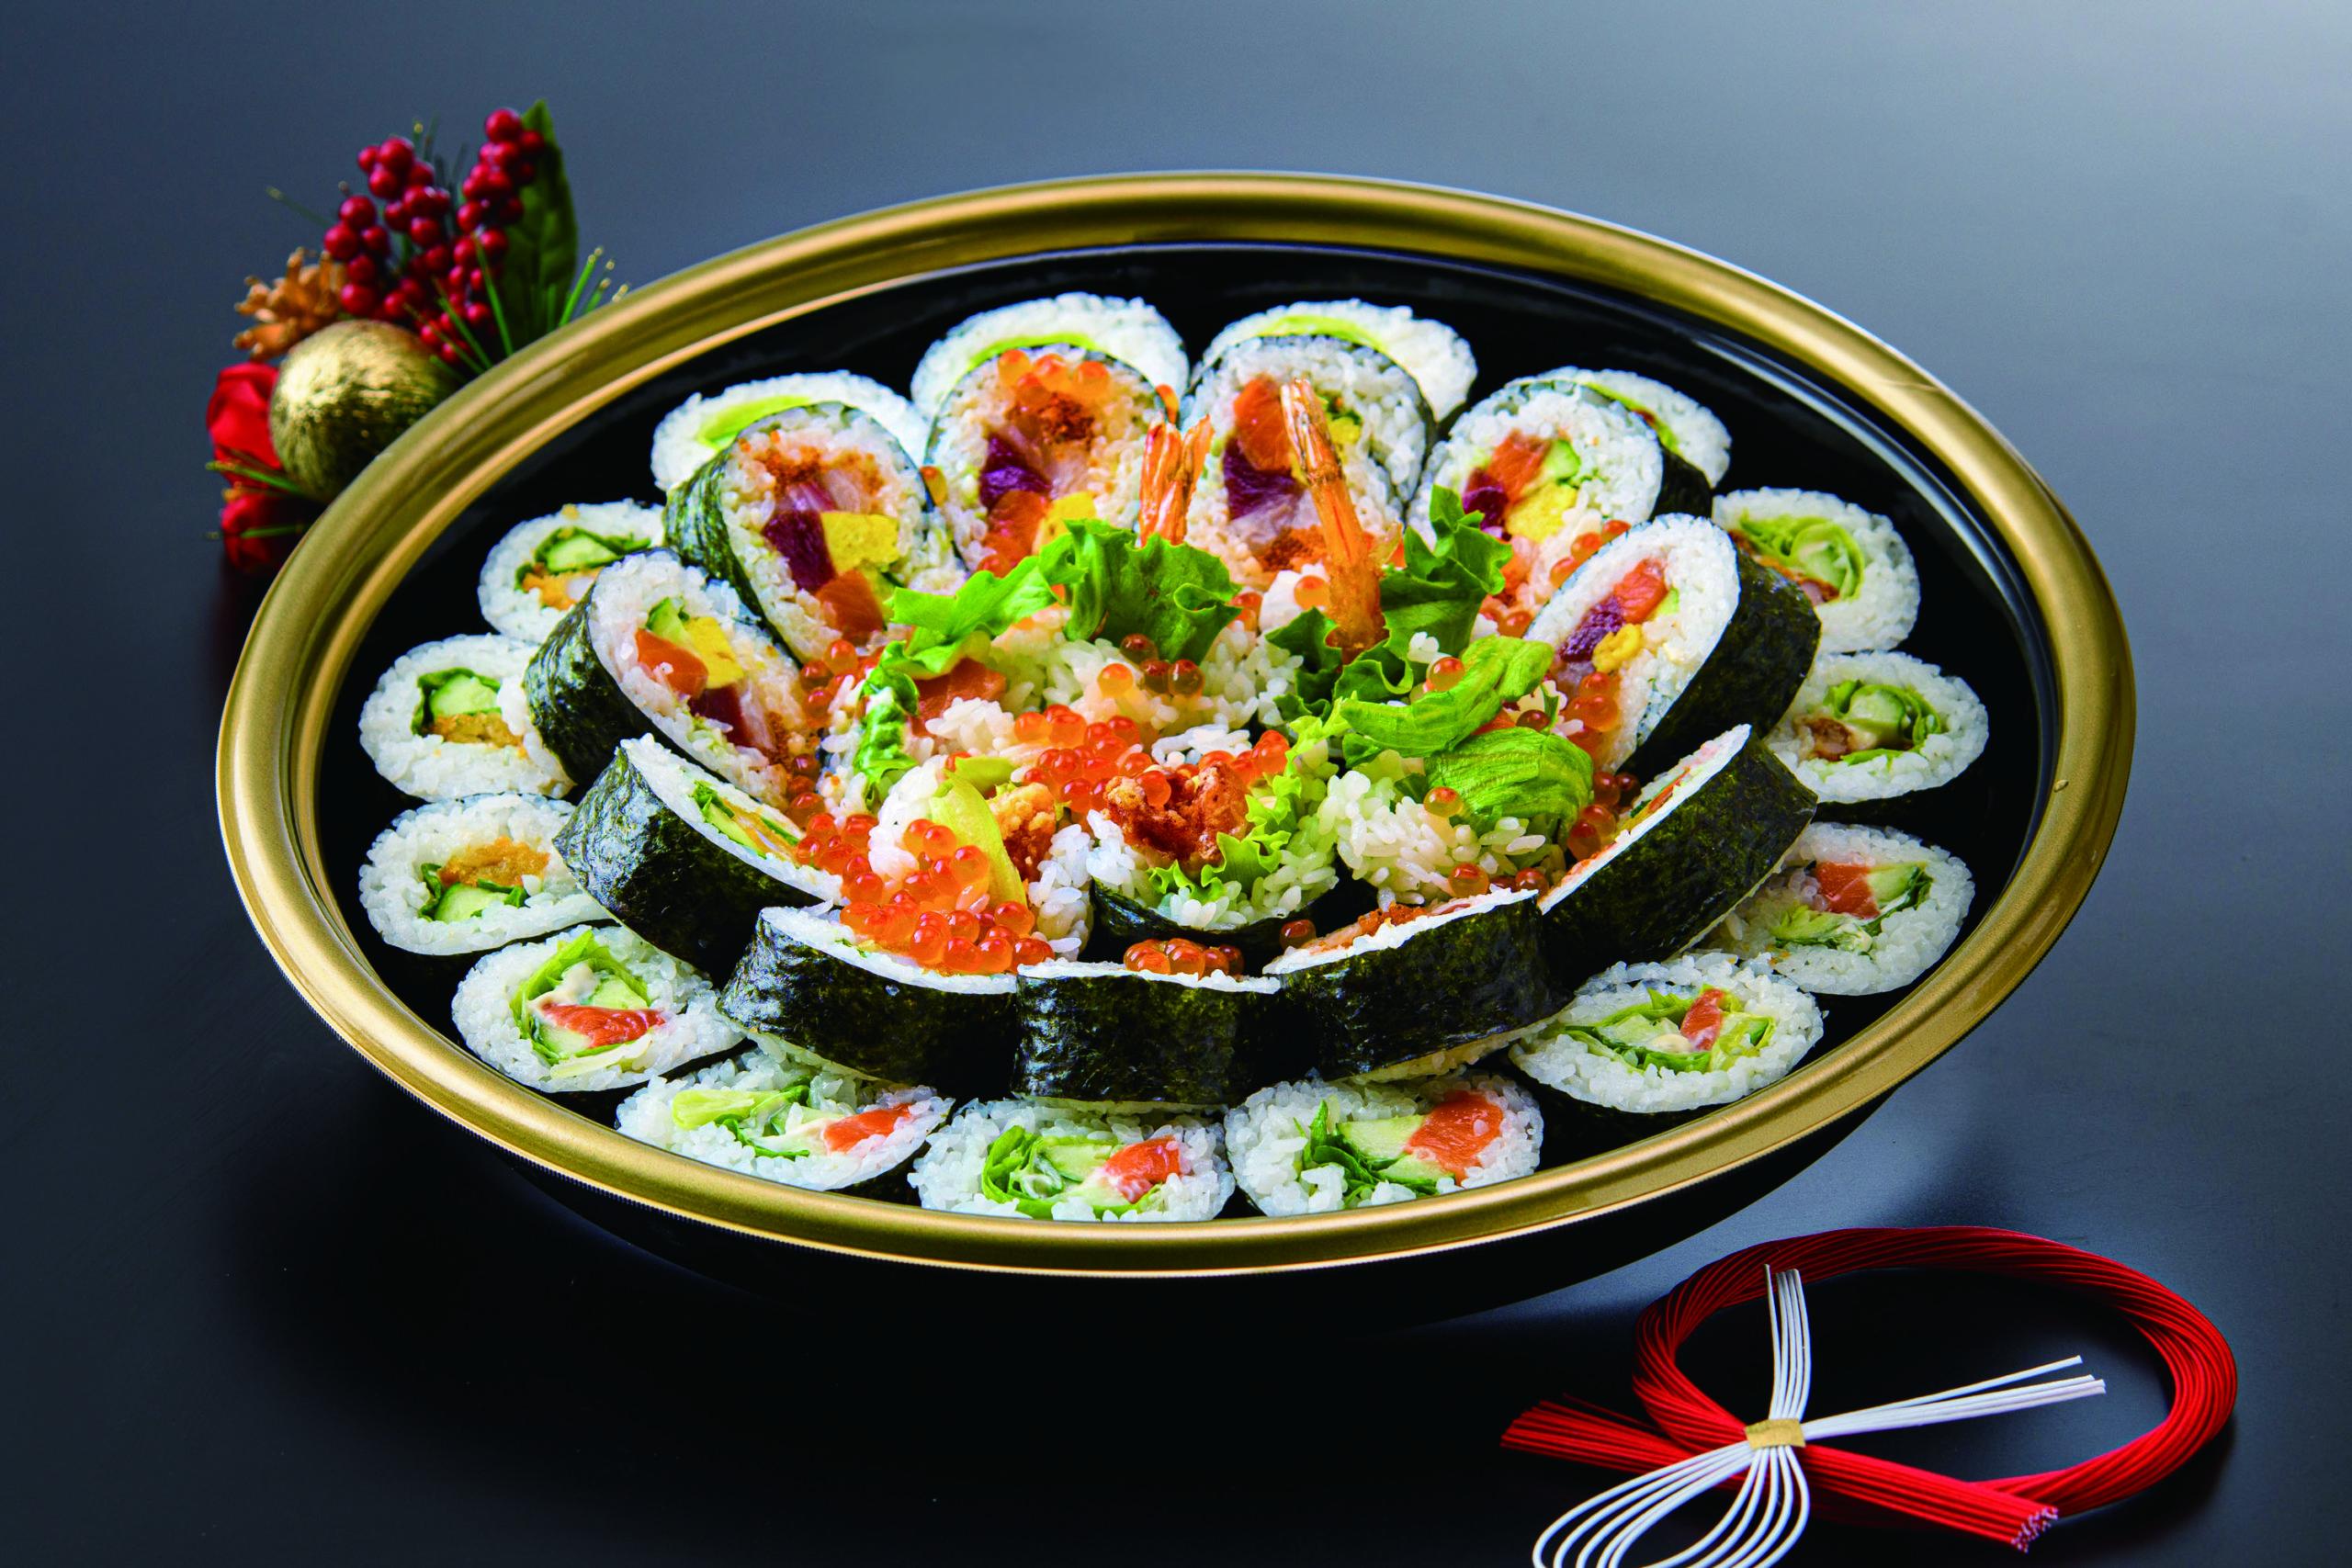 年末 巻き寿司 十勝